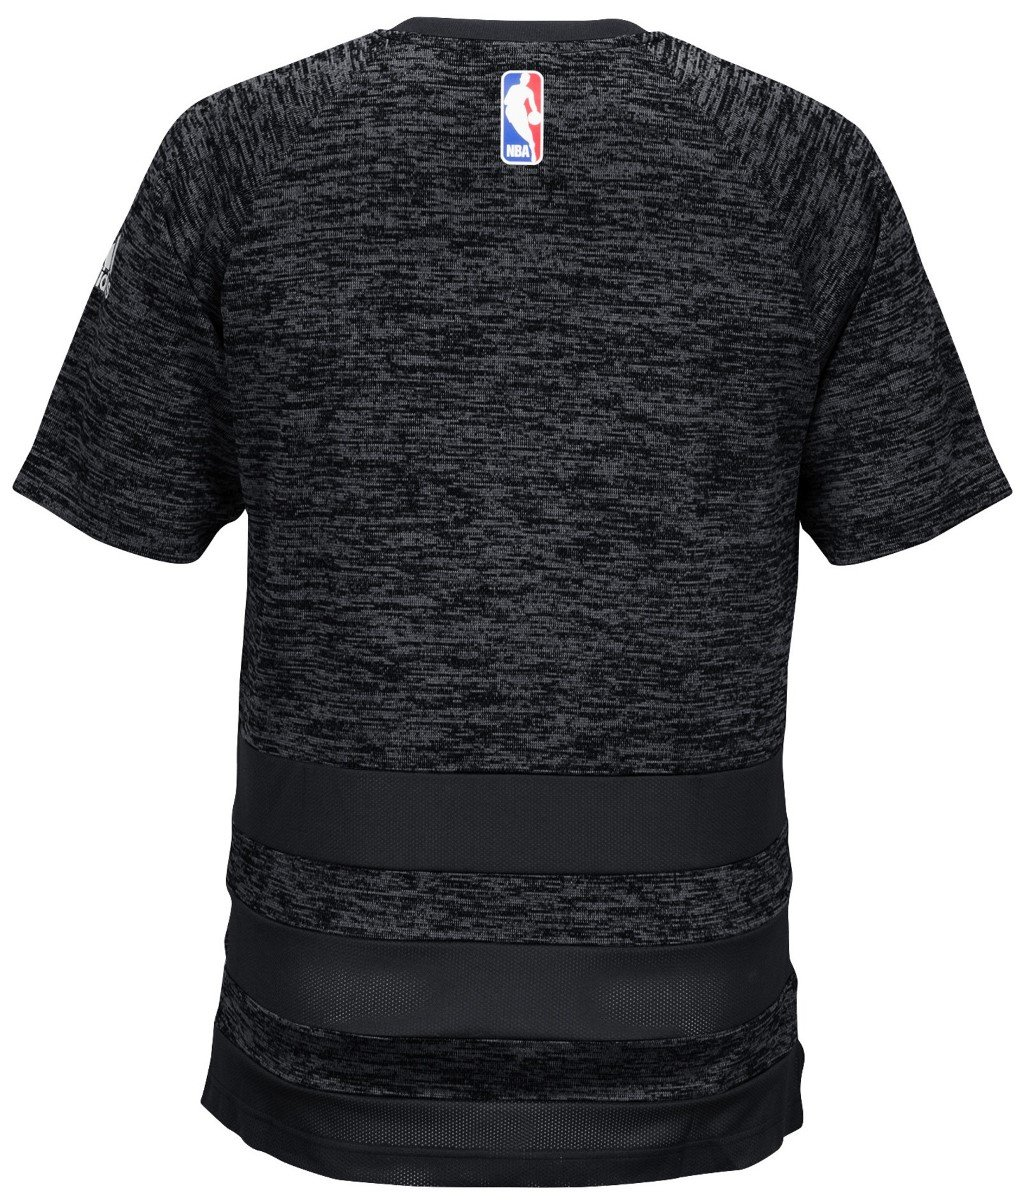 best service a38af c1457 Amazon.com : adidas Houston Rockets 2016 NBA Men's On-Court ...